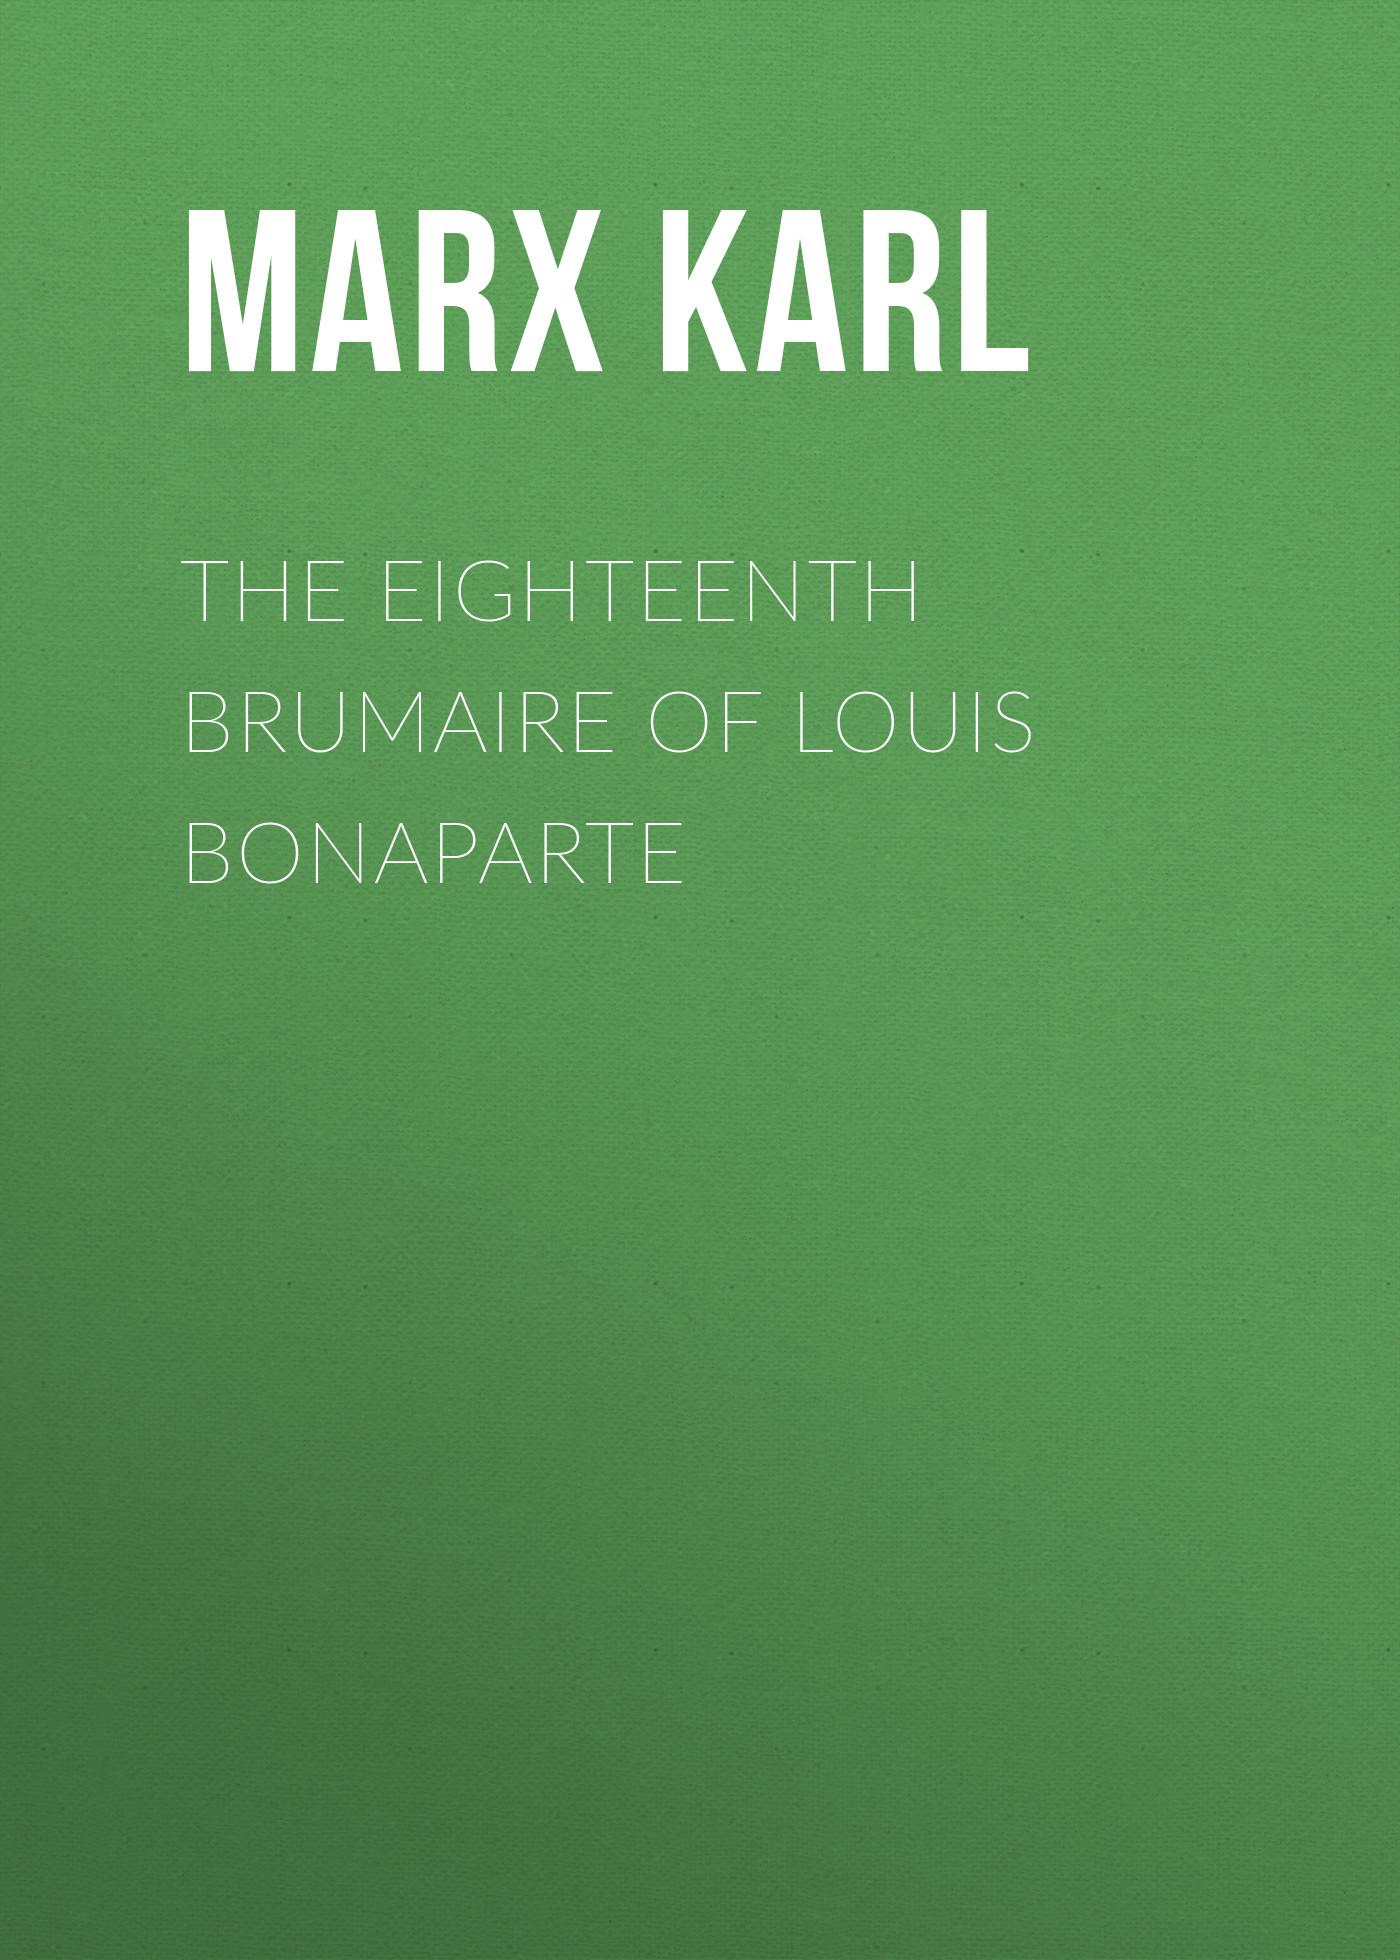 Marx Karl The Eighteenth Brumaire of Louis Bonaparte воллин ульф robert schuinann philharmonie karl marx stadt франк бирманн ulf wallin schumann complete works for violin